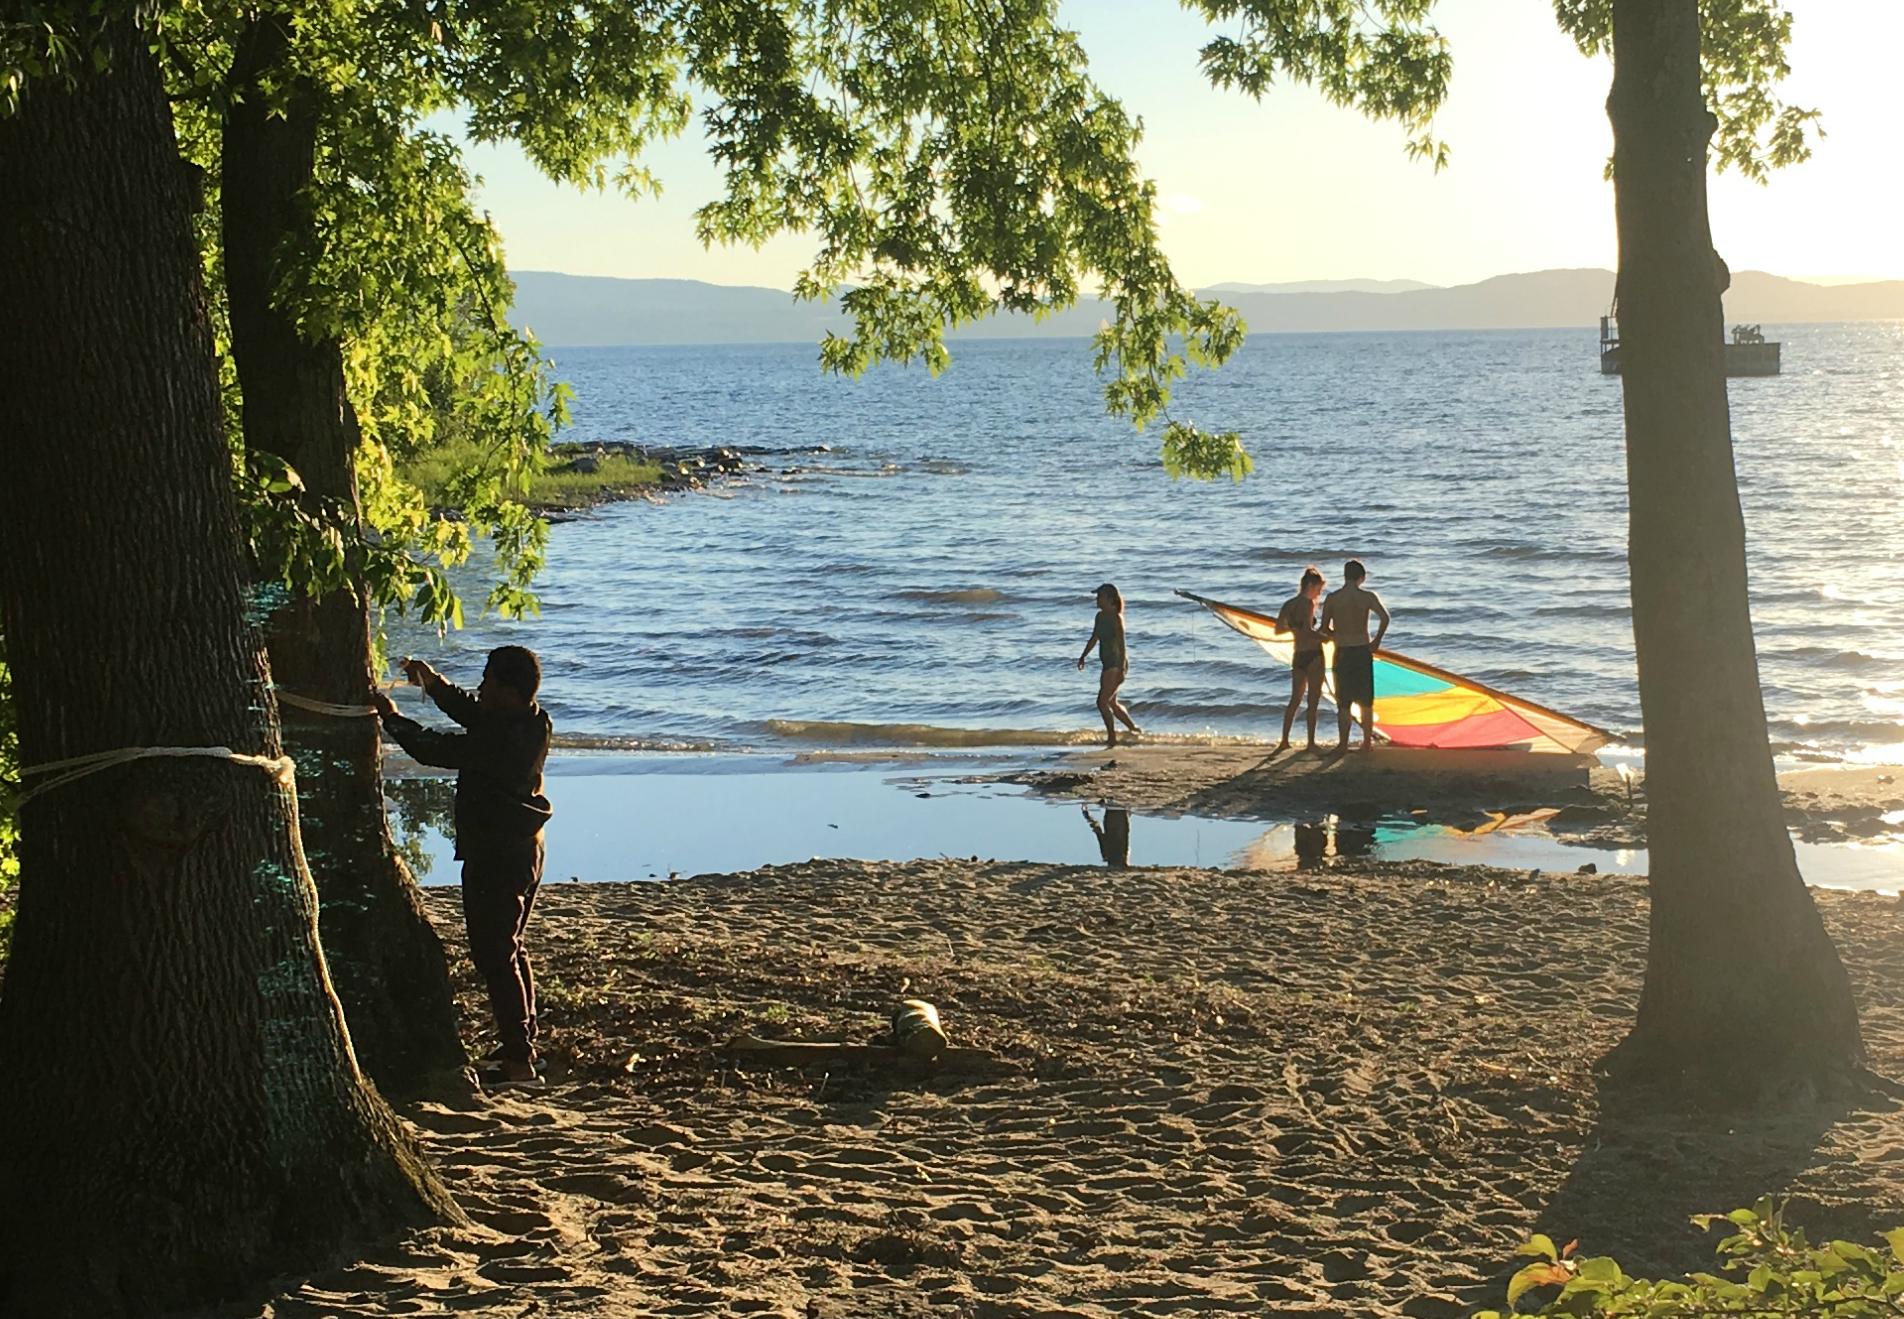 Sewage spill closes Burlington beaches, again | Burlington Free Press